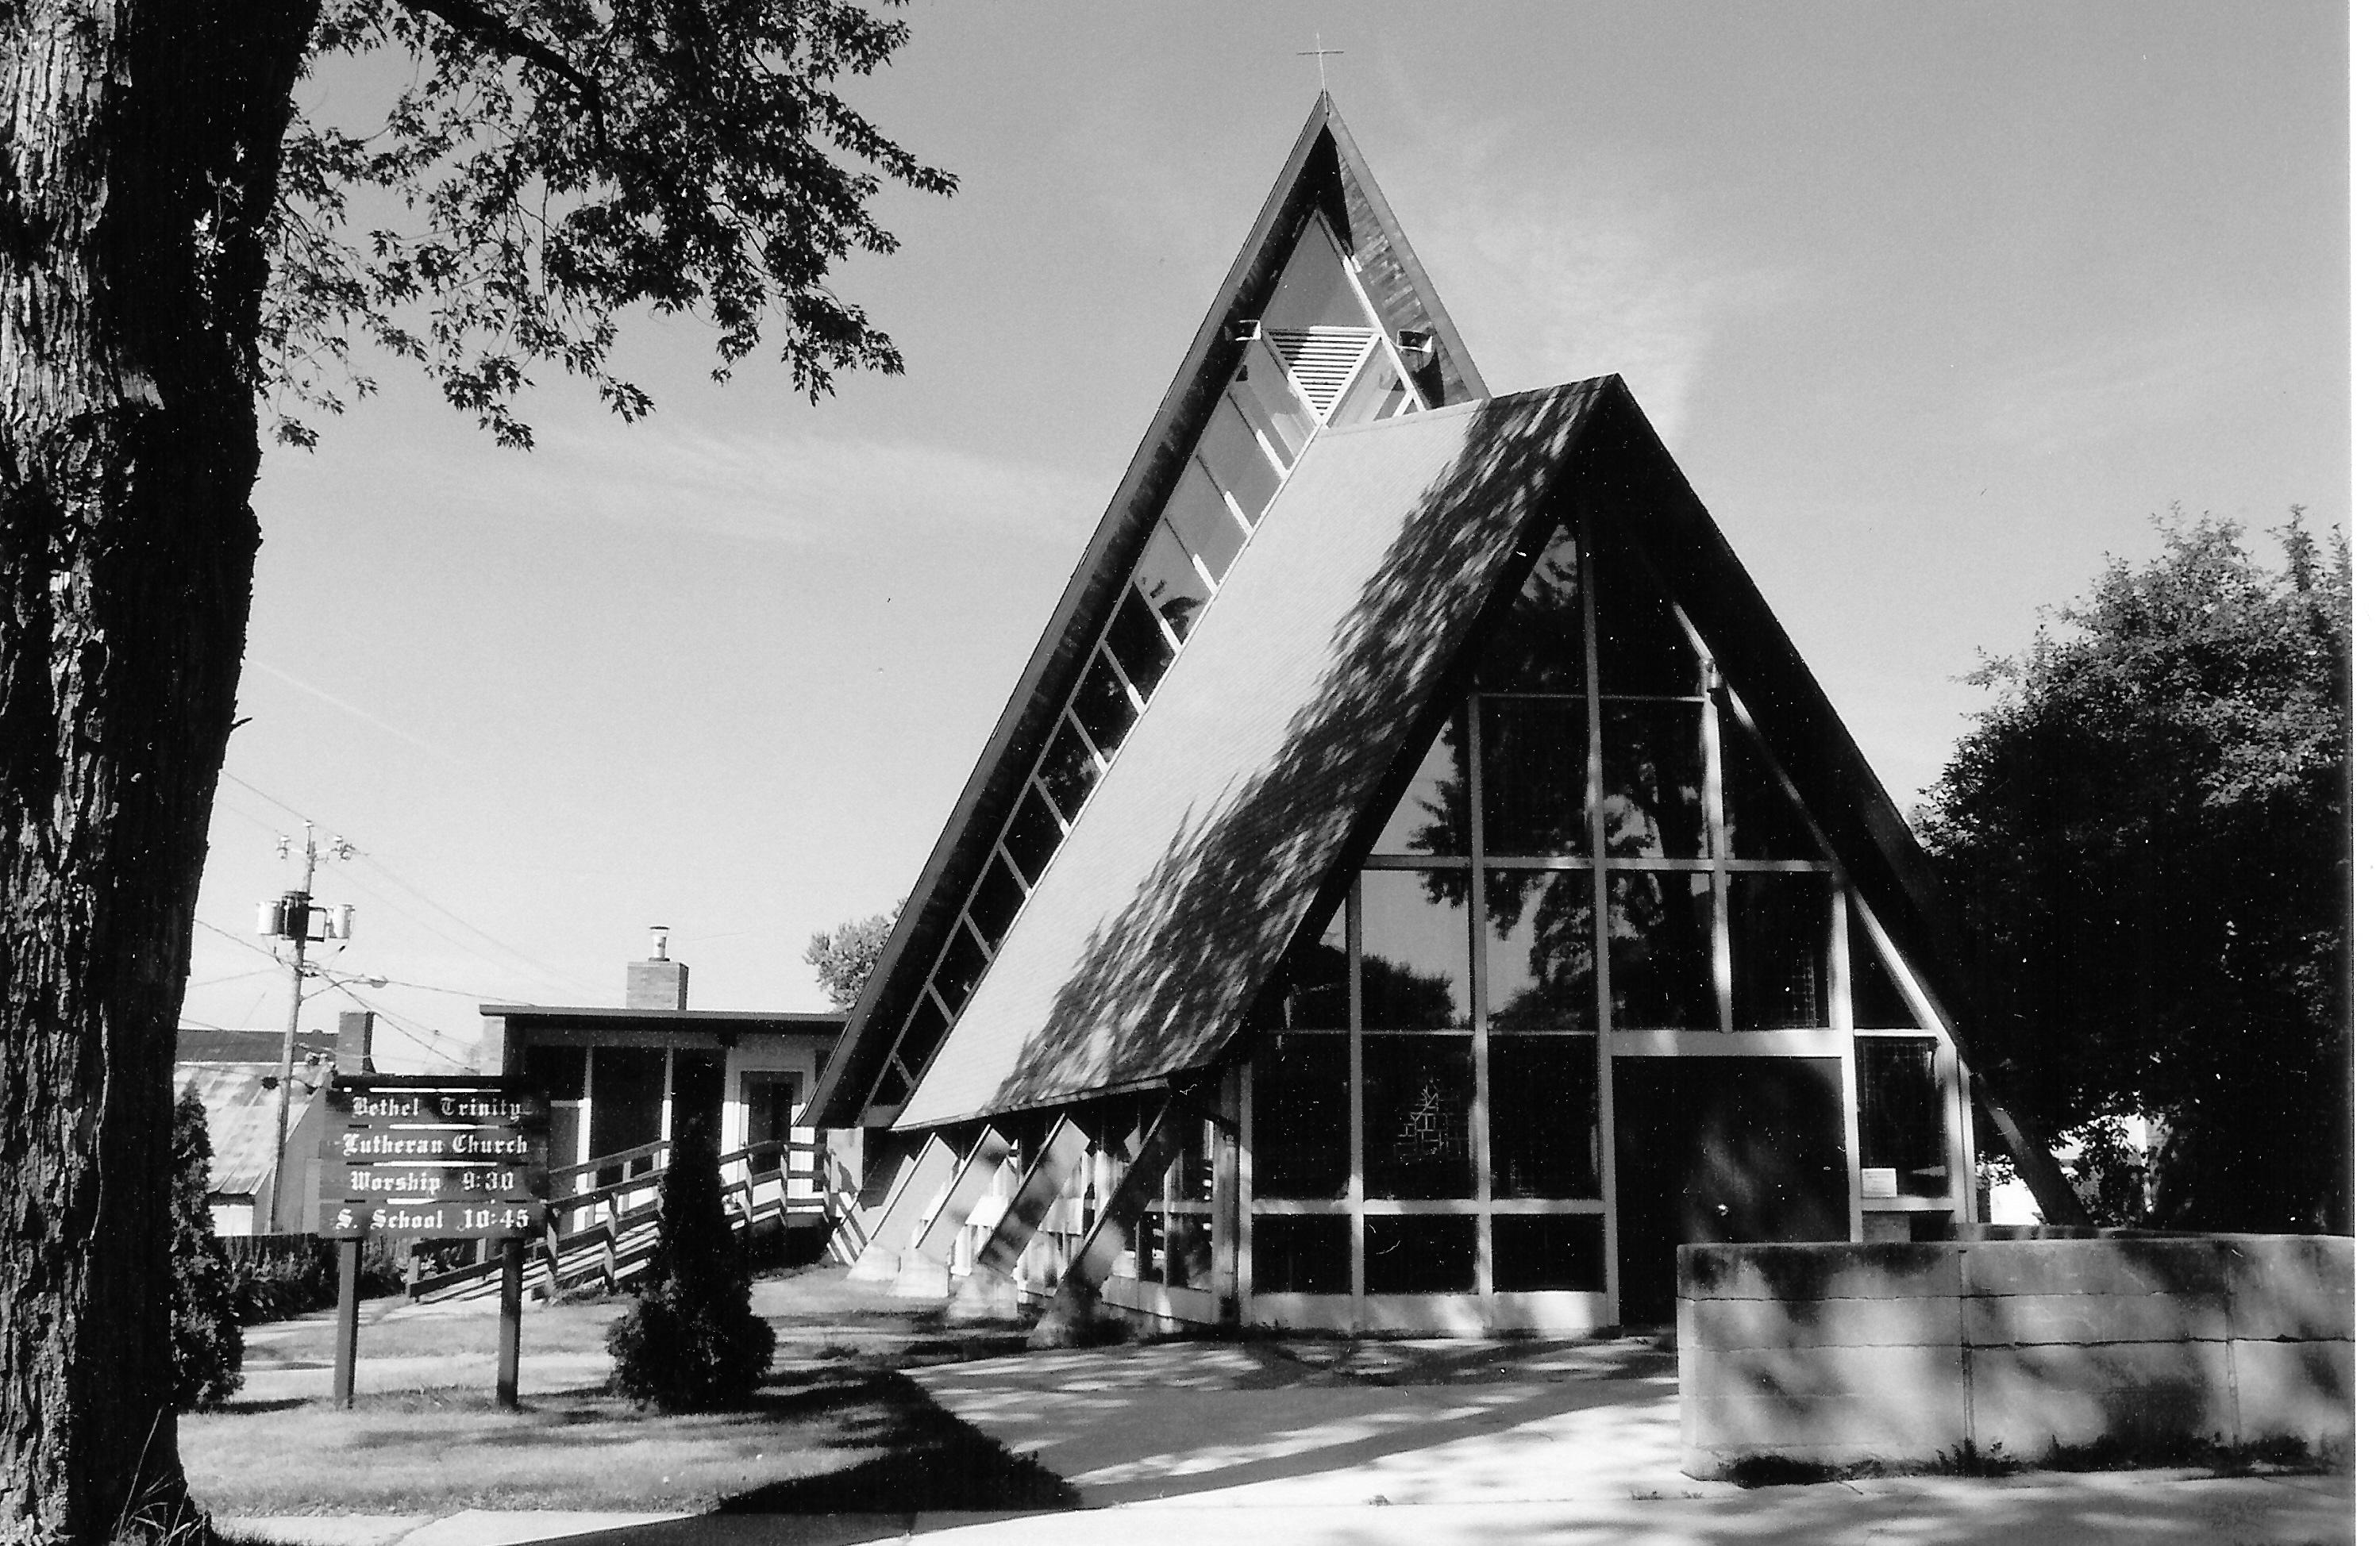 Bethel Lutheran